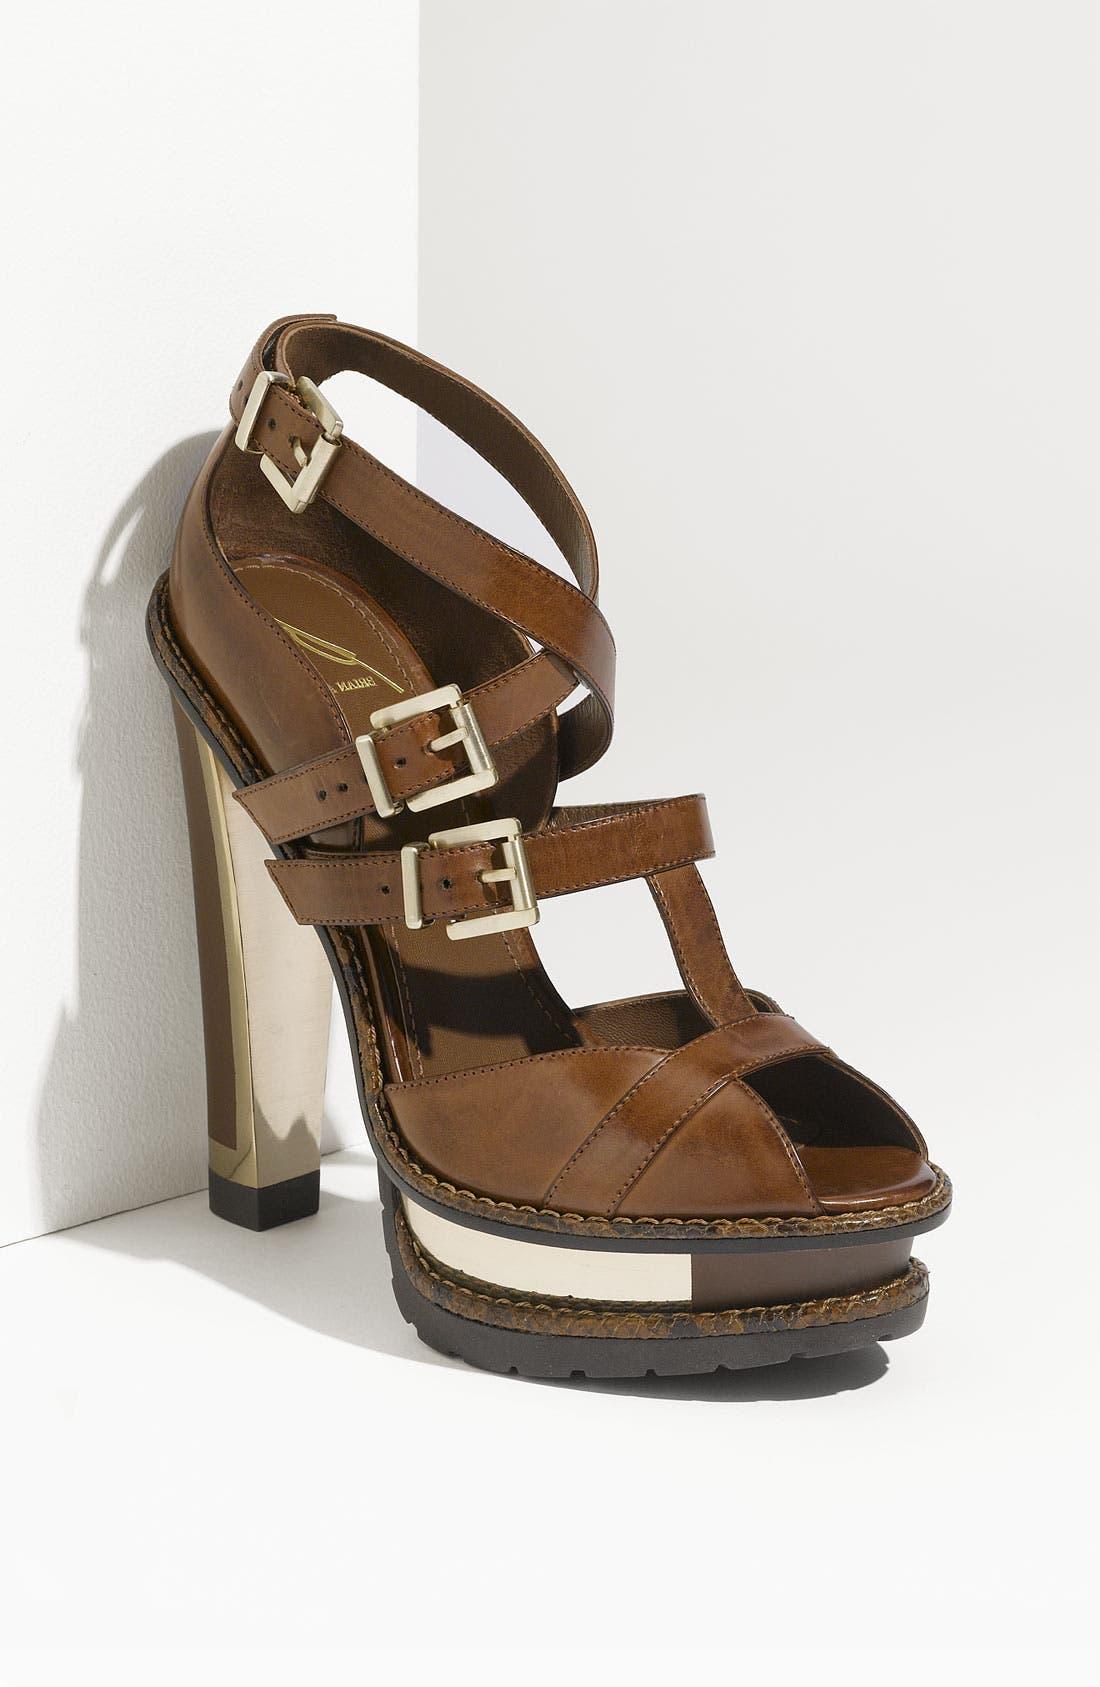 Main Image - B Brian Atwood 'Teatro' High Heel Sandal